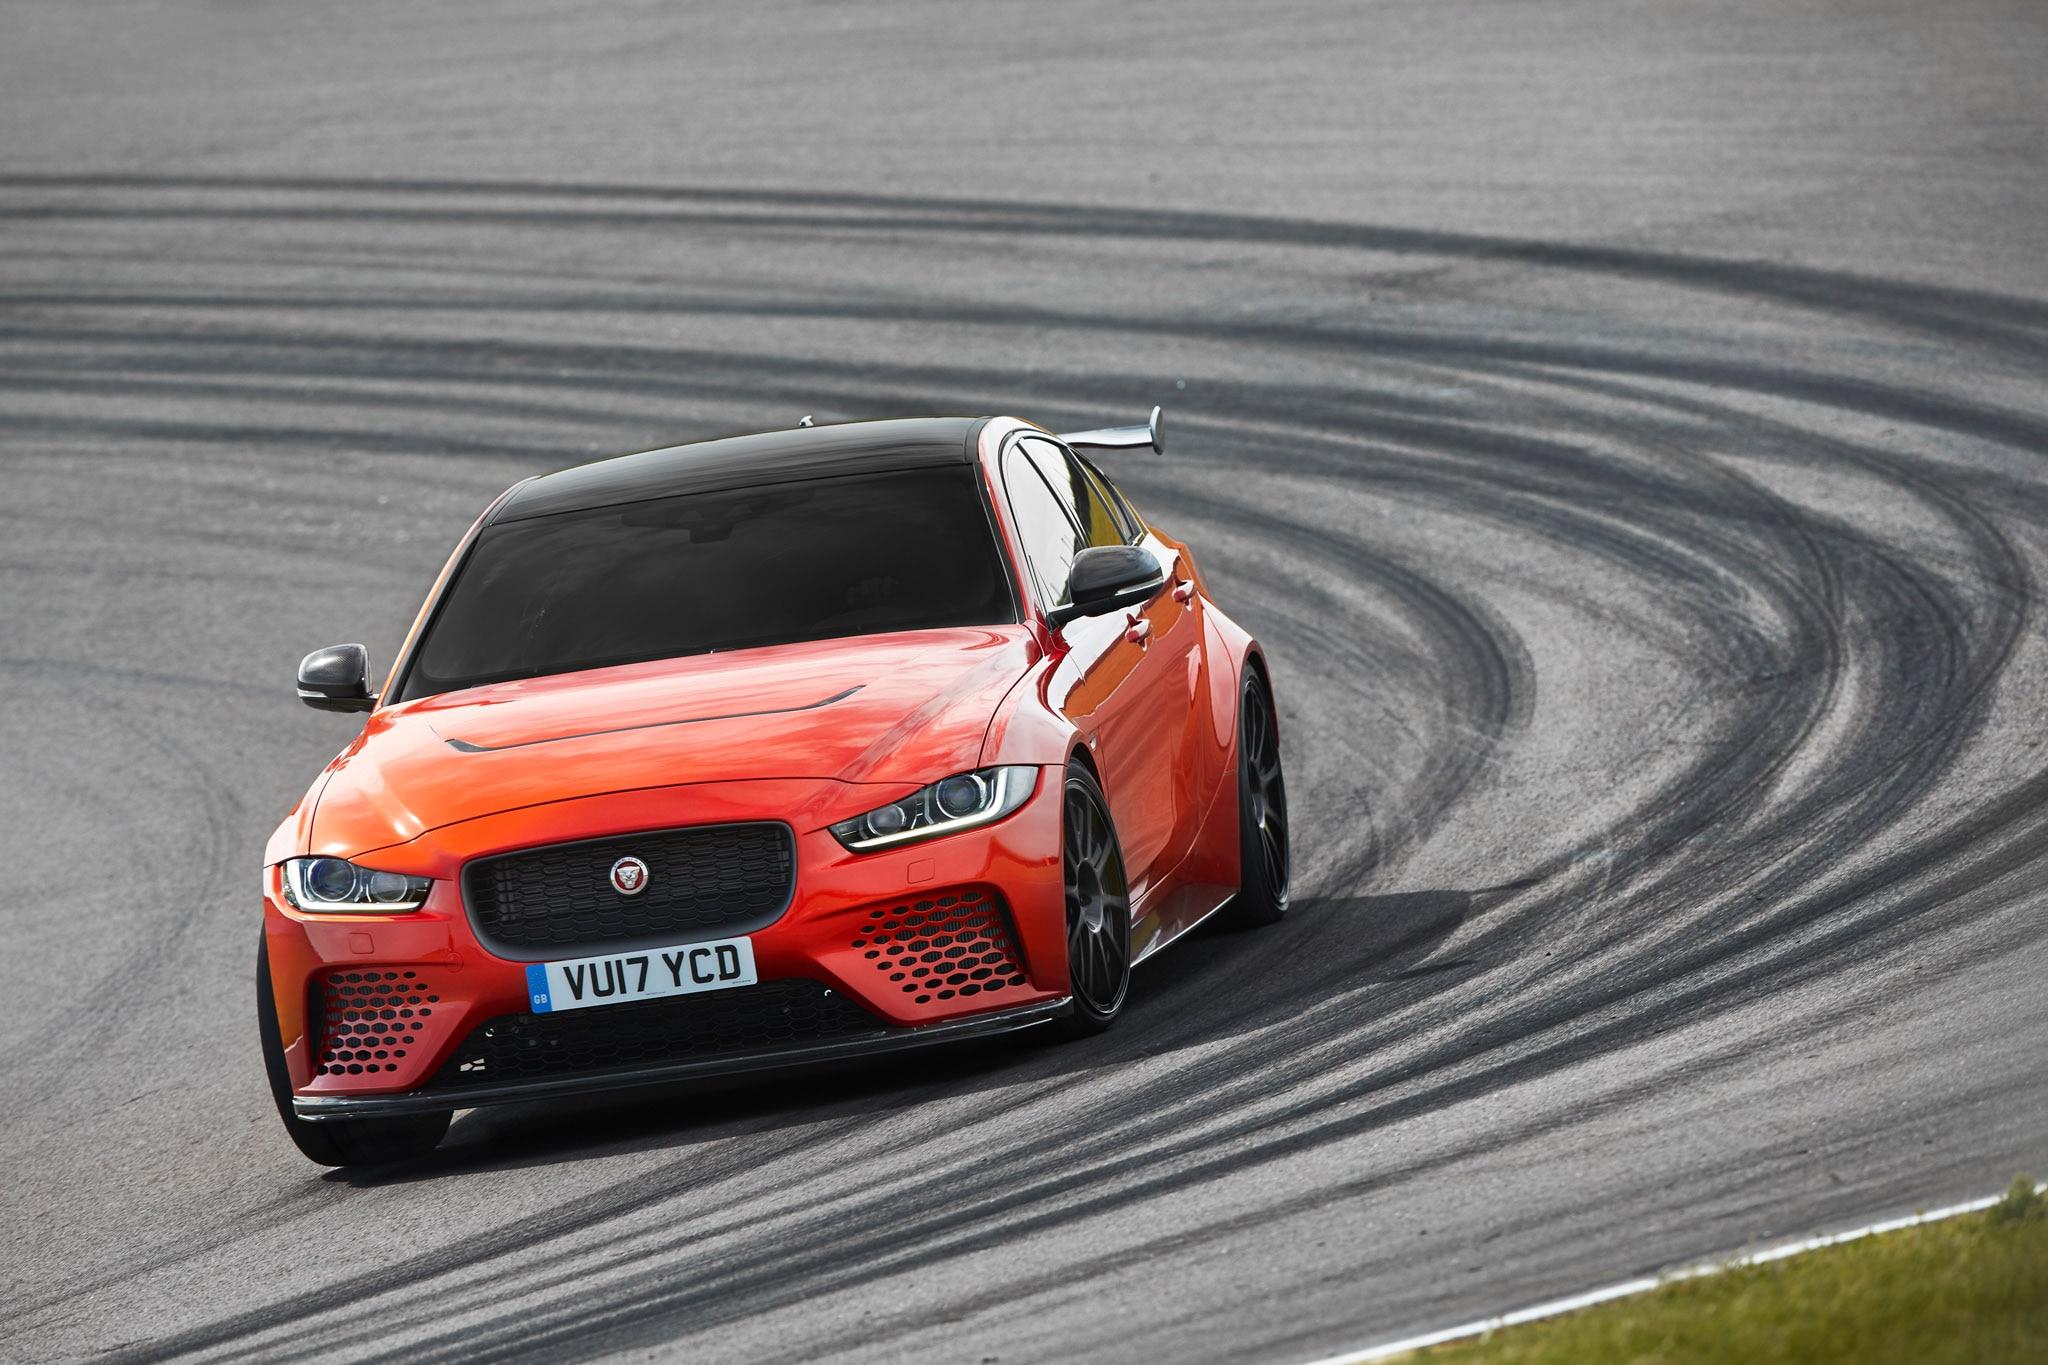 2018 jaguar xe svr. Delighful 2018 If  With 2018 Jaguar Xe Svr